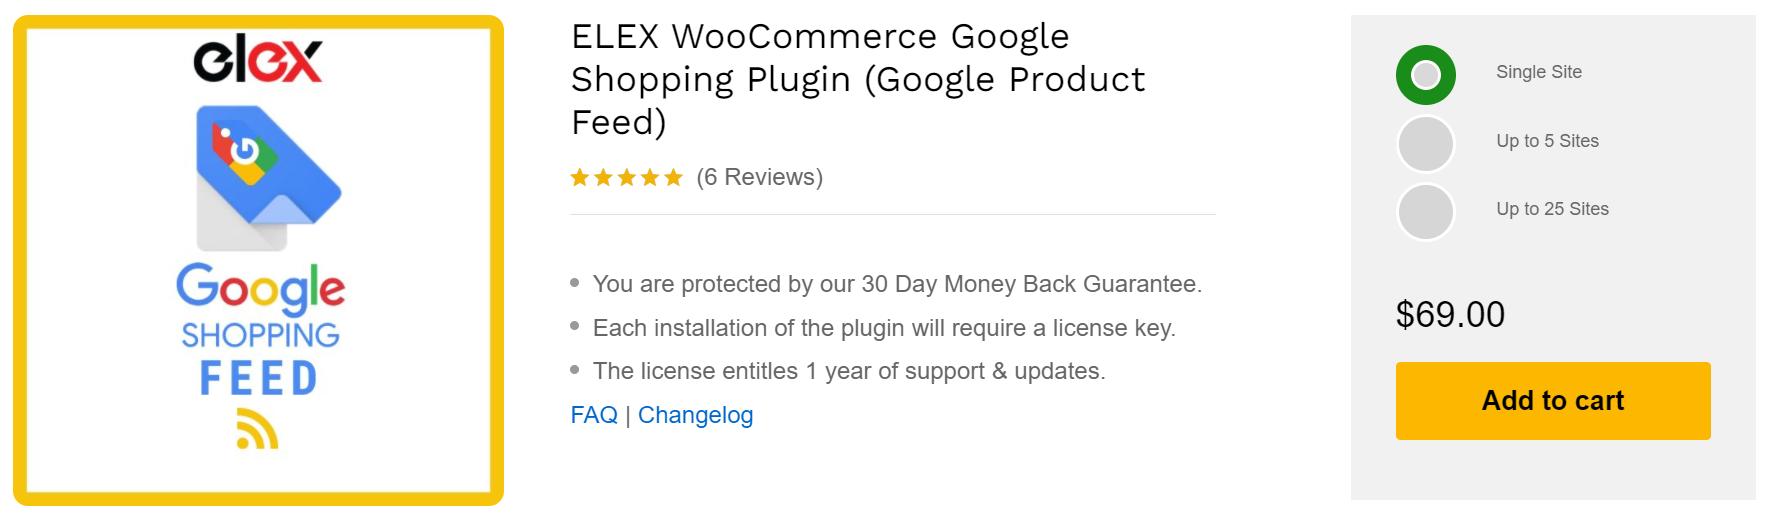 ELEX Google Product Feed Plugin